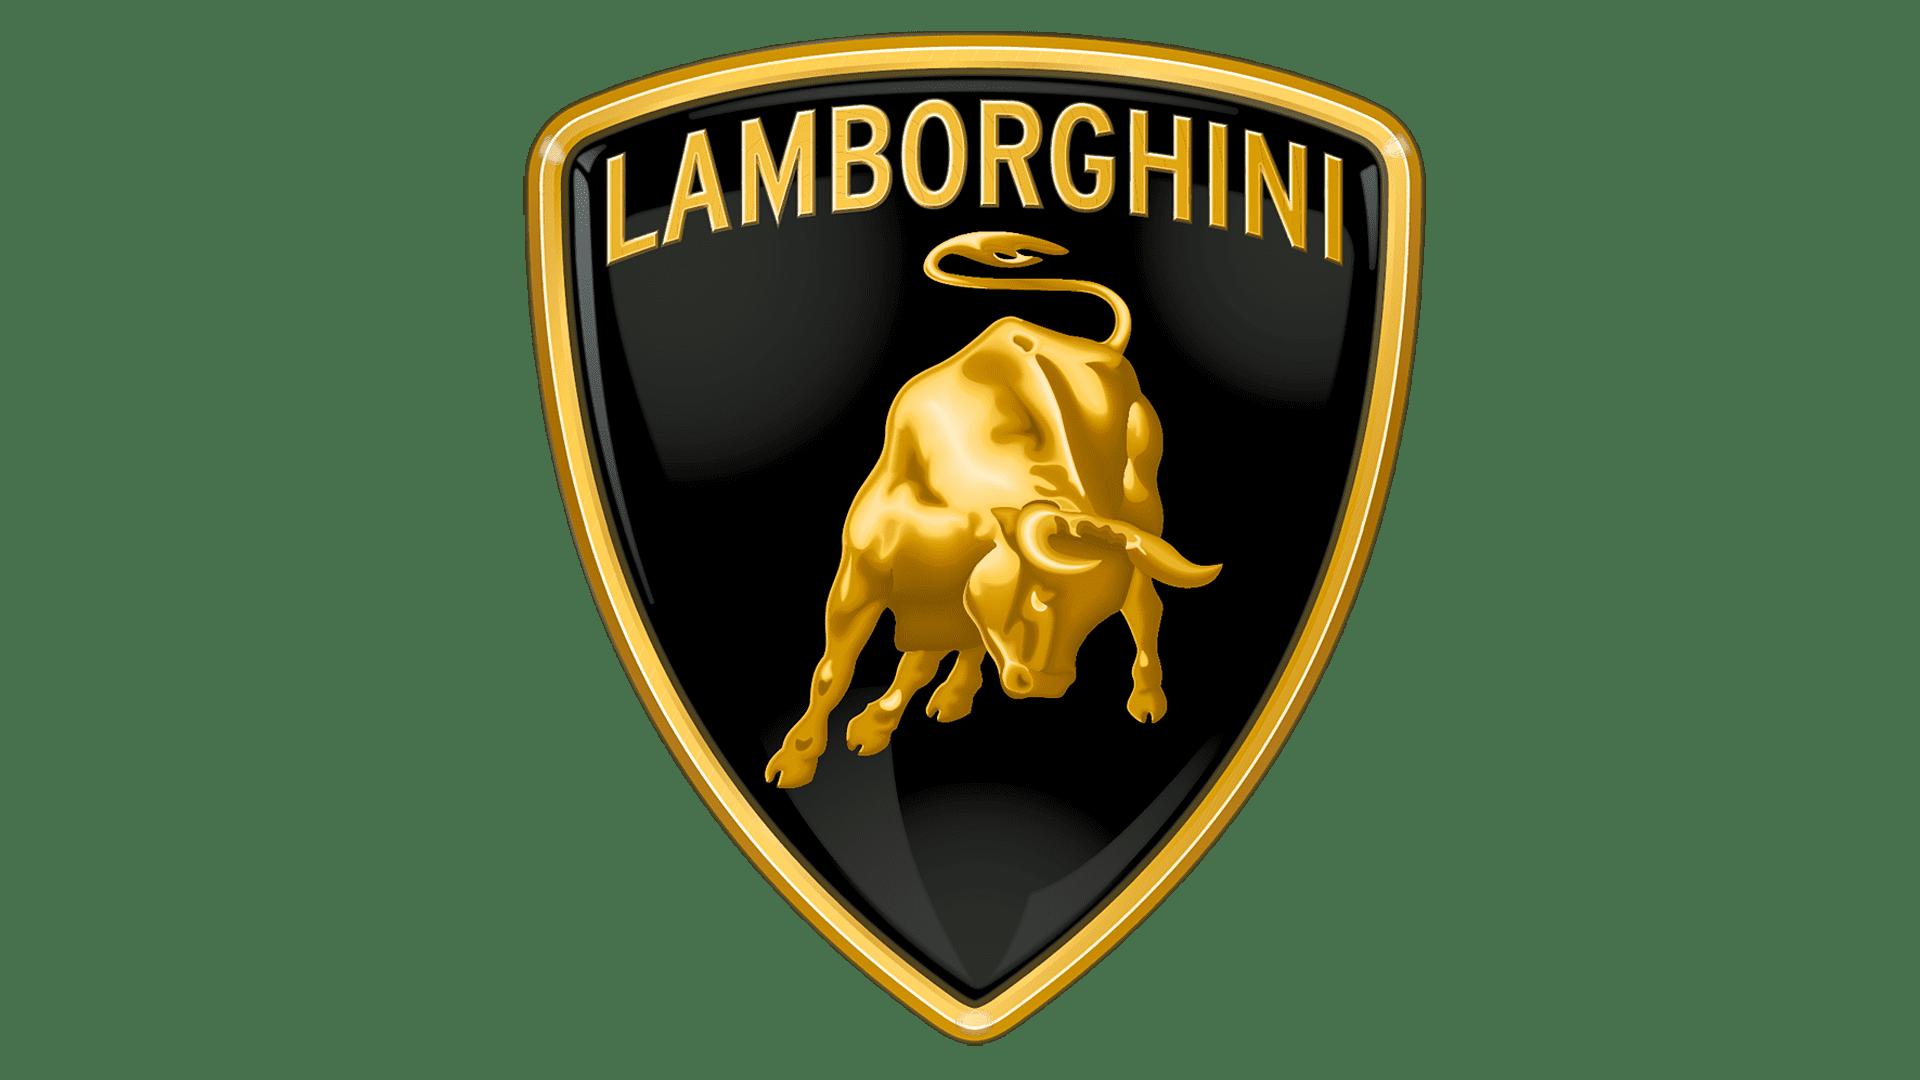 Lamborghini Logo Lamborghini Symbol Meaning History And